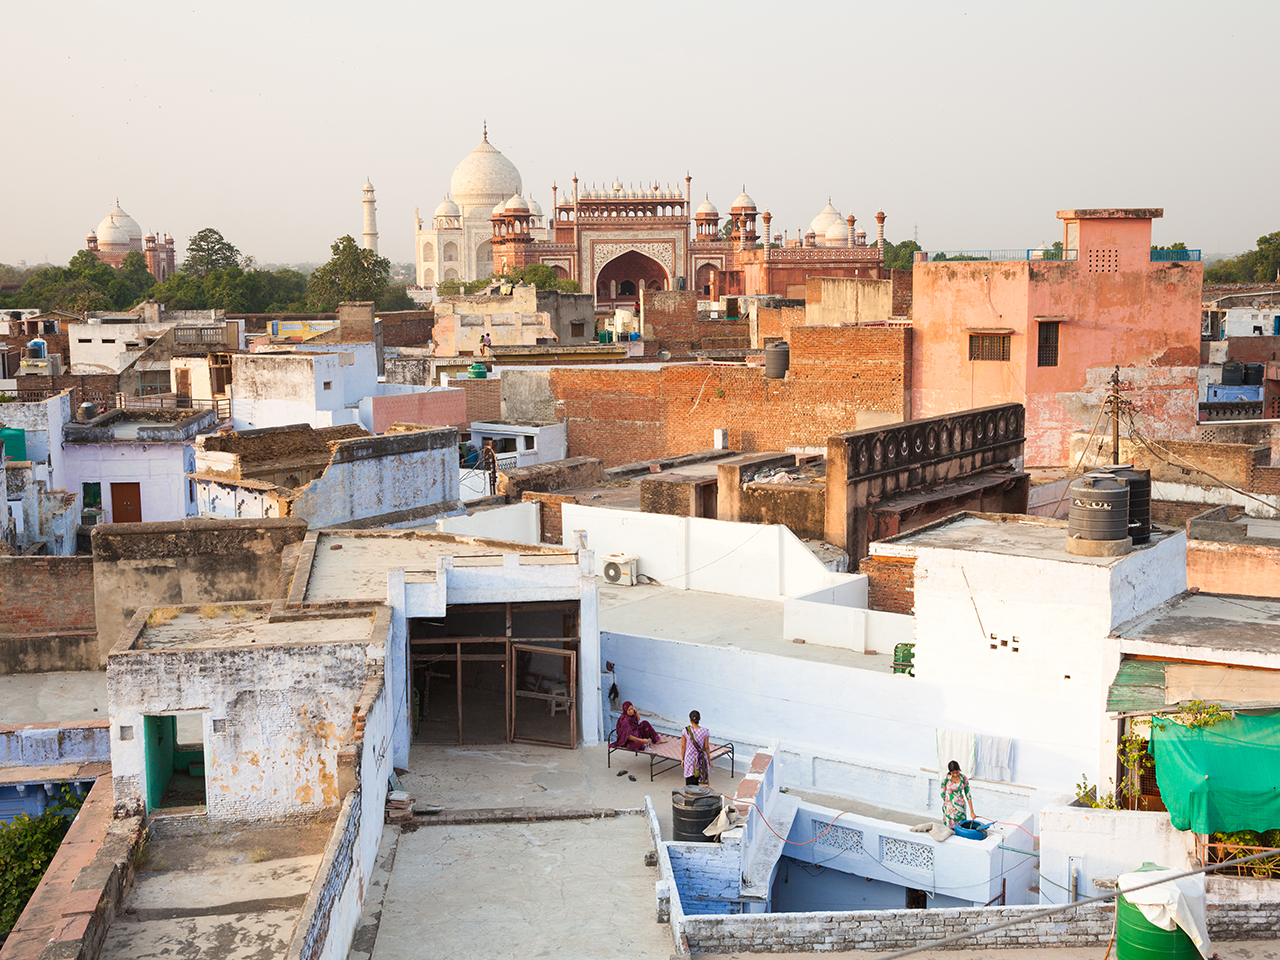 Путешествие по Индии: Вид на Тадж-Махал с крыши отеля